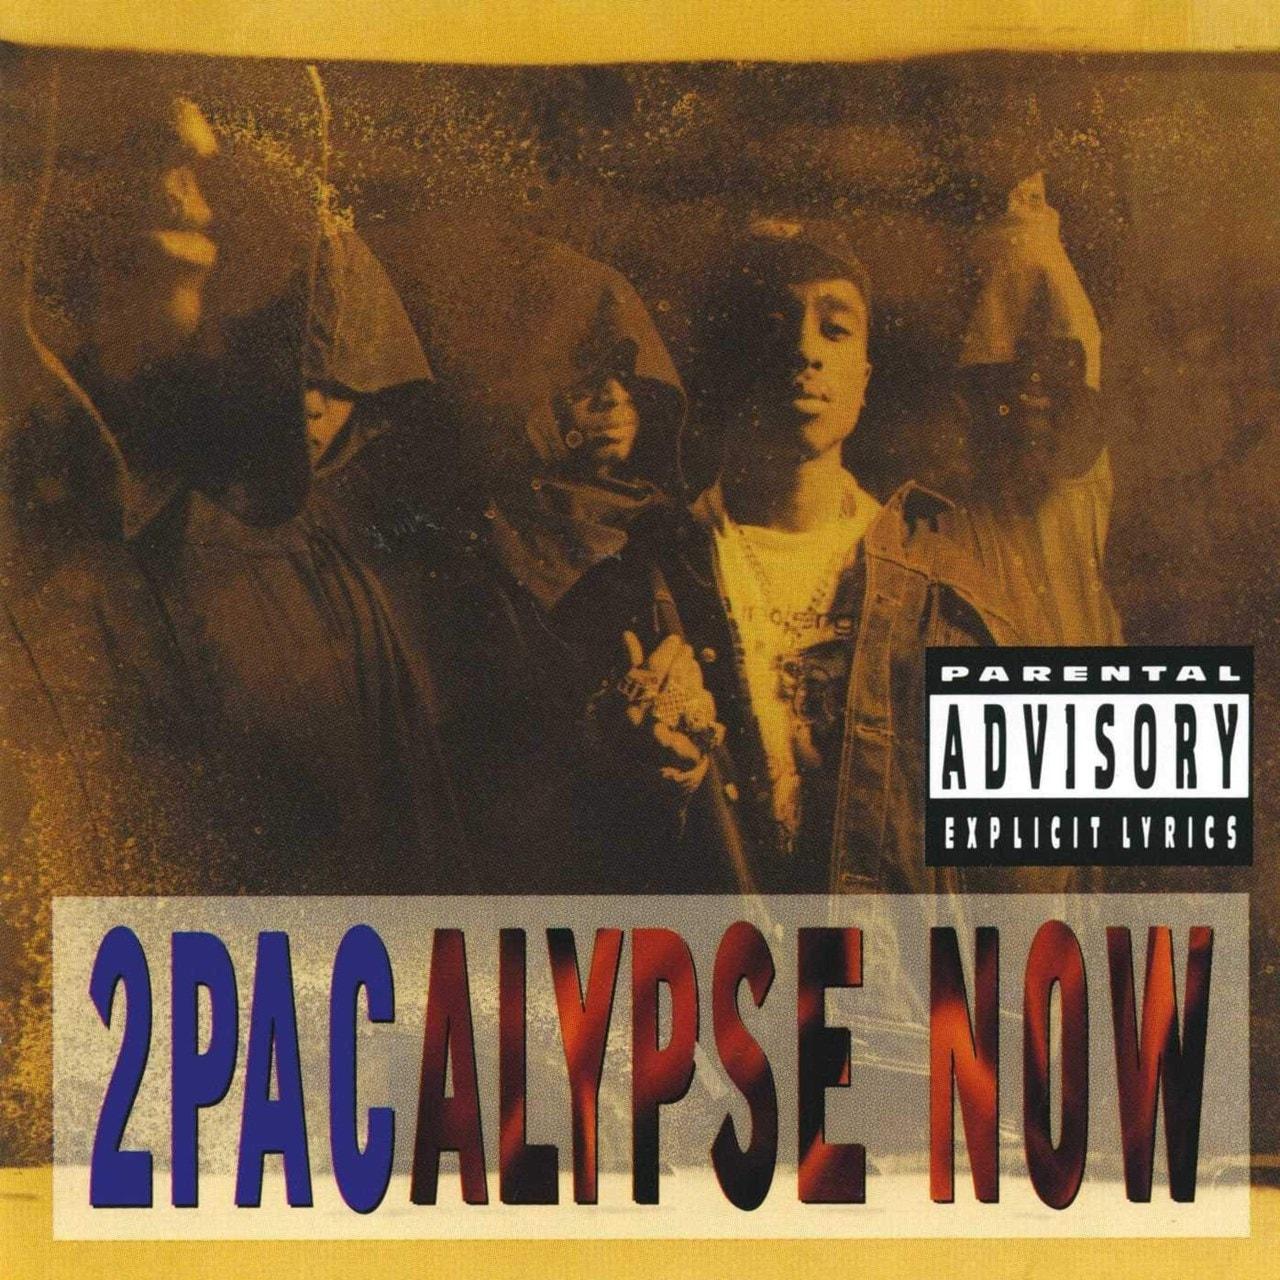 2Pacalypse Now - 1